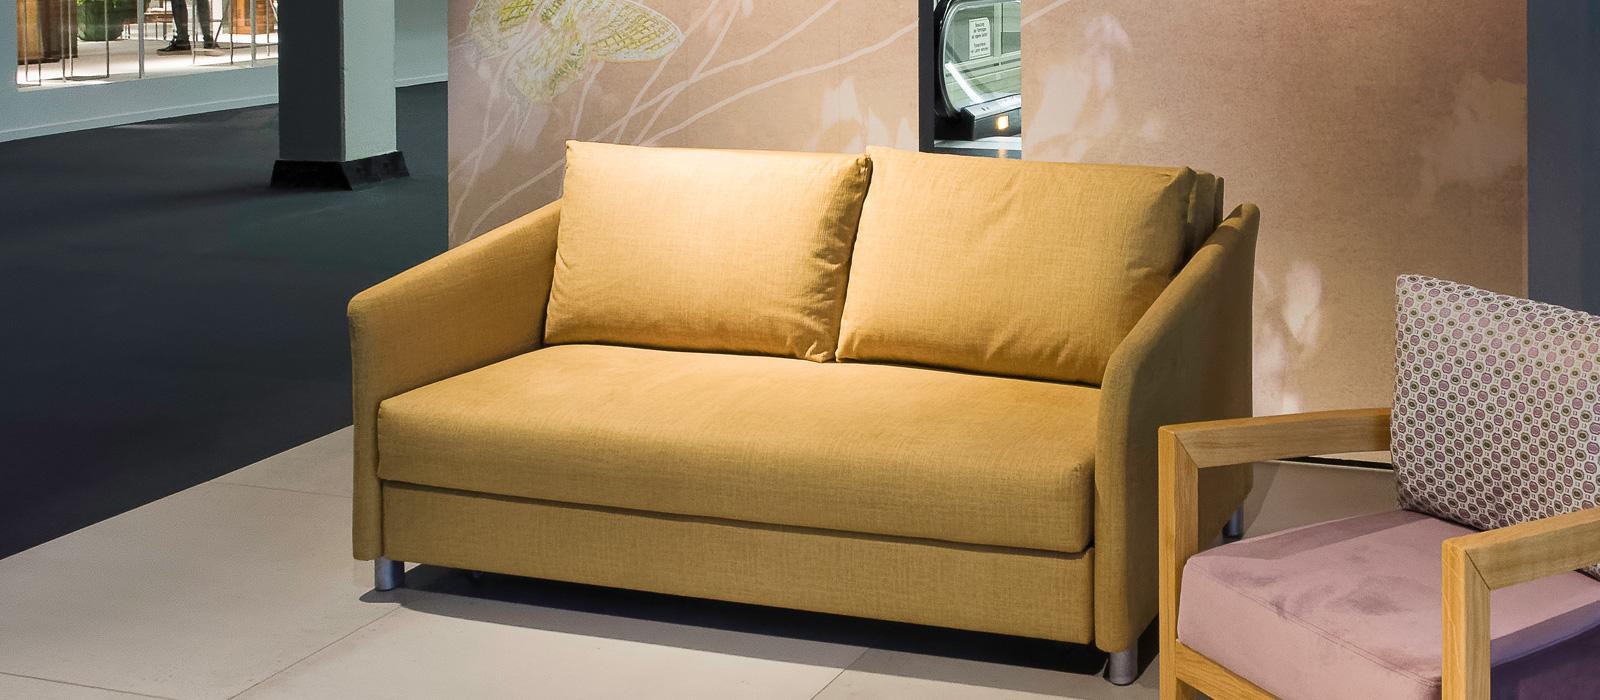 gianni schlafsofa von franz fertig sofabed. Black Bedroom Furniture Sets. Home Design Ideas